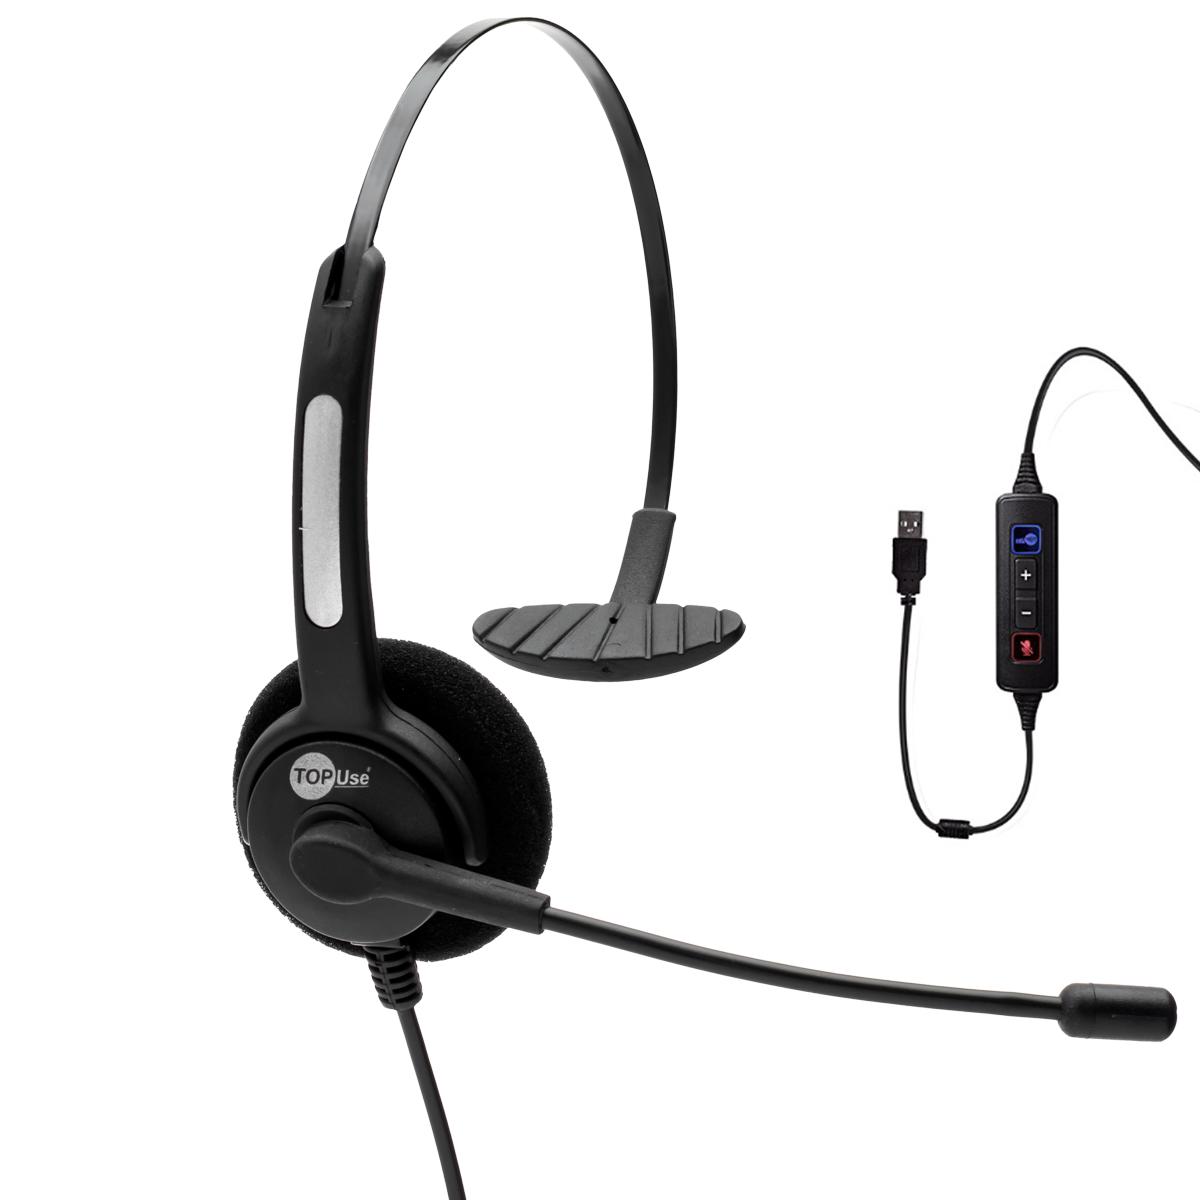 Headset USB VoIP c/ Tubo Flexível HTU-300 - TopUse